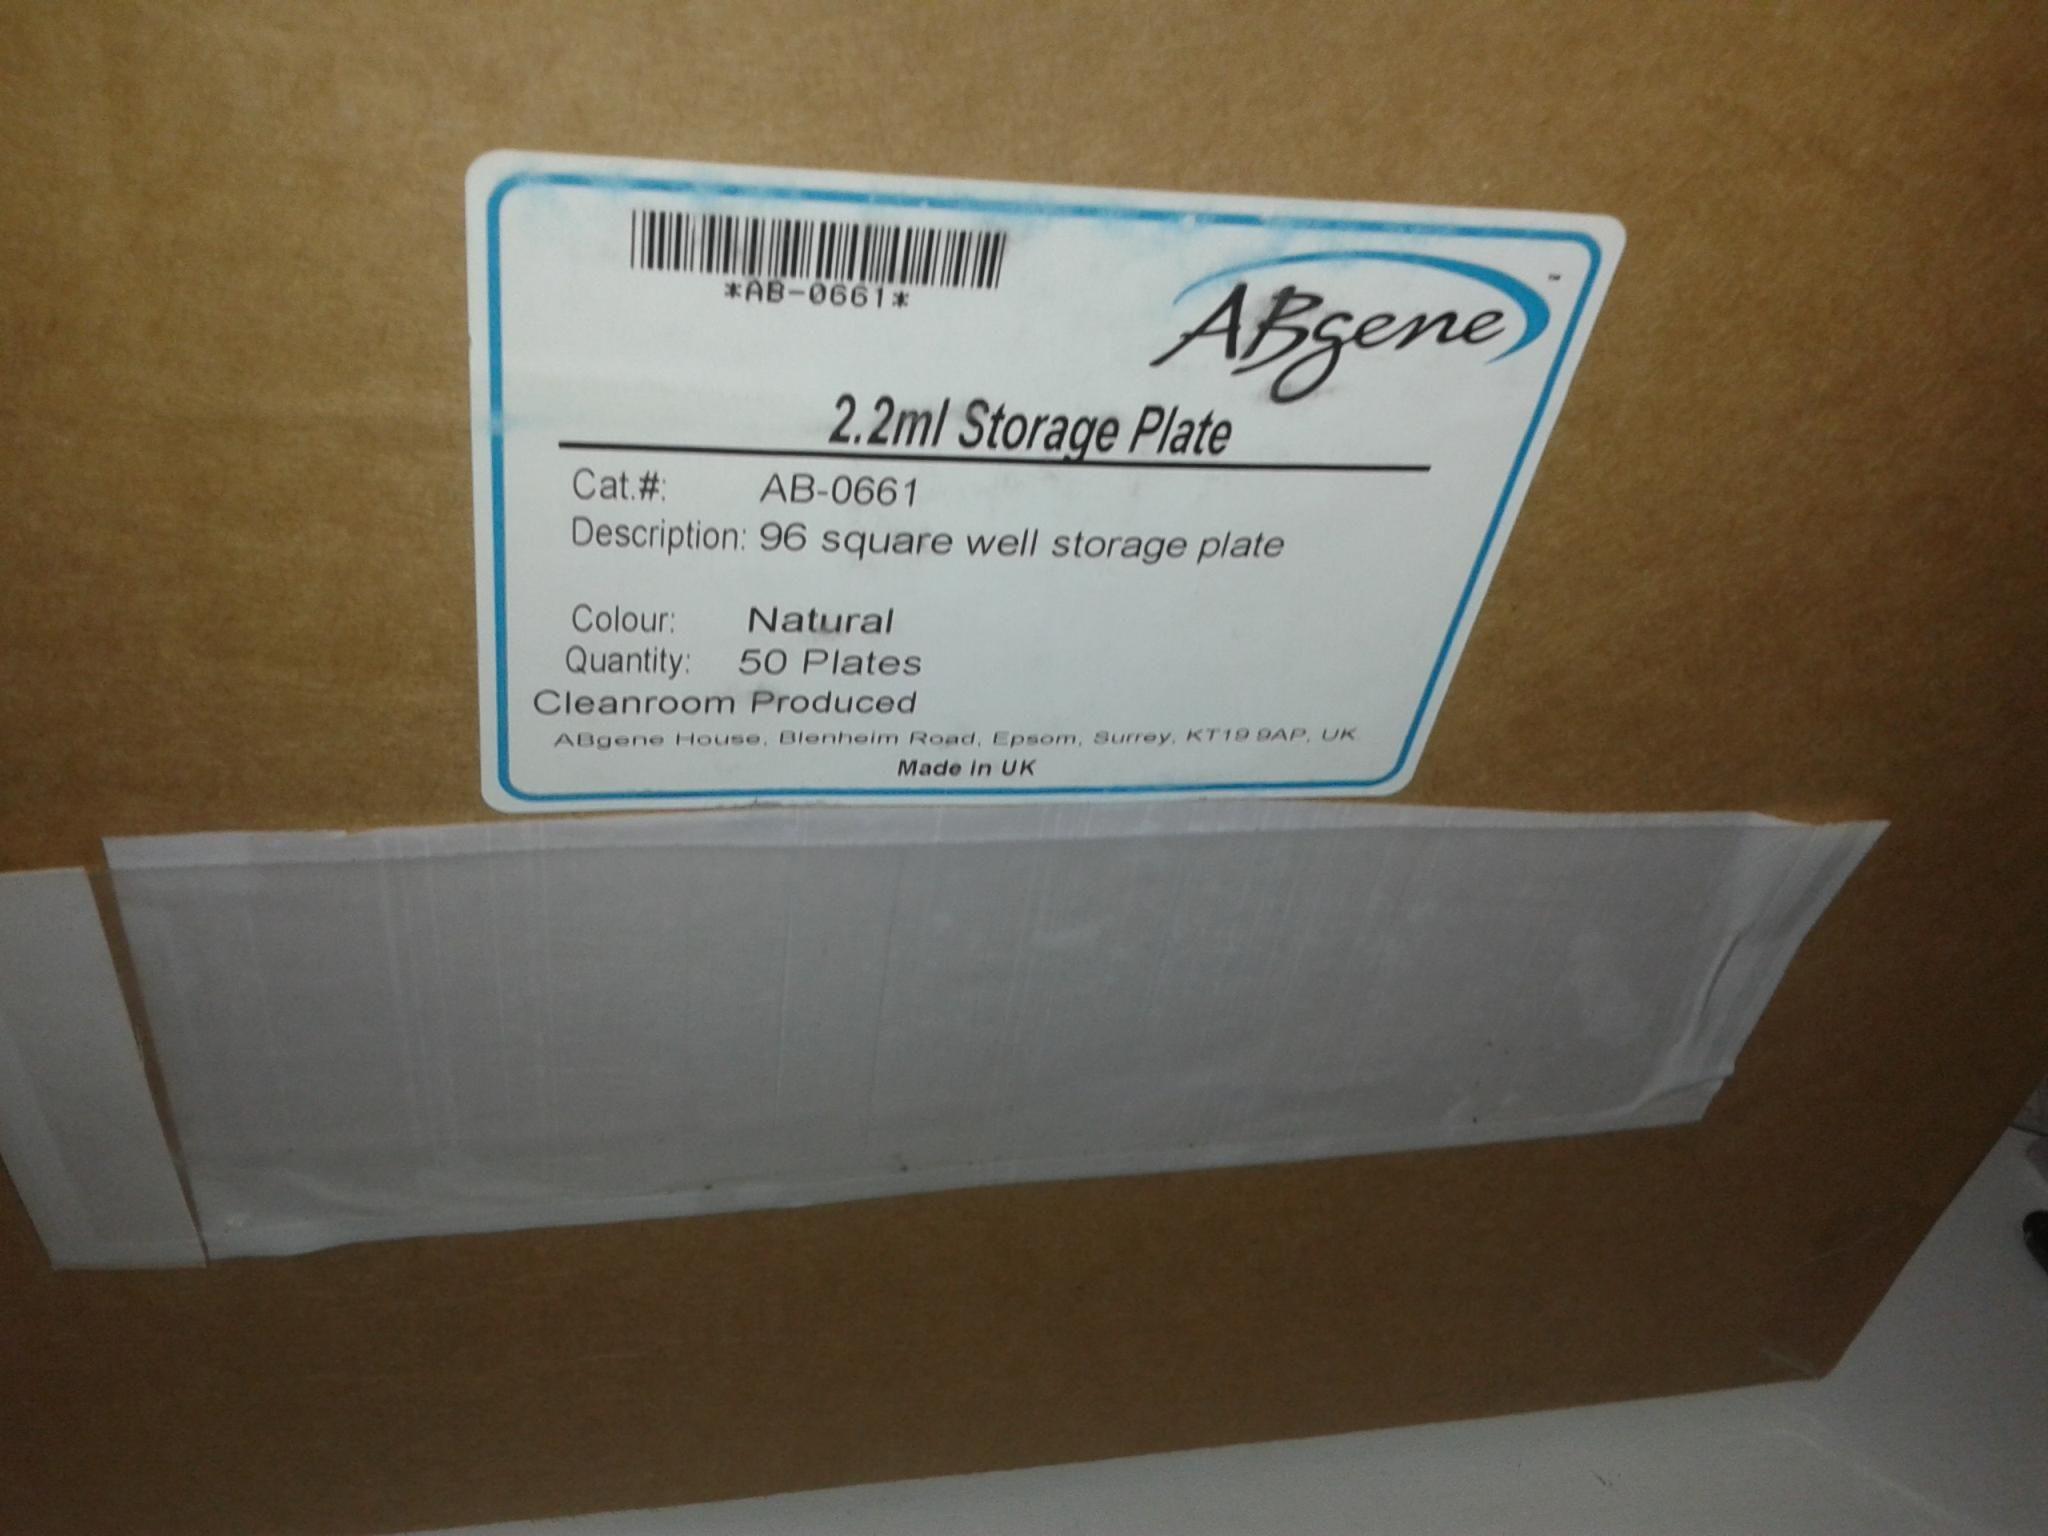 ABgene 2.2ml Storage Plate cat.AB-0661